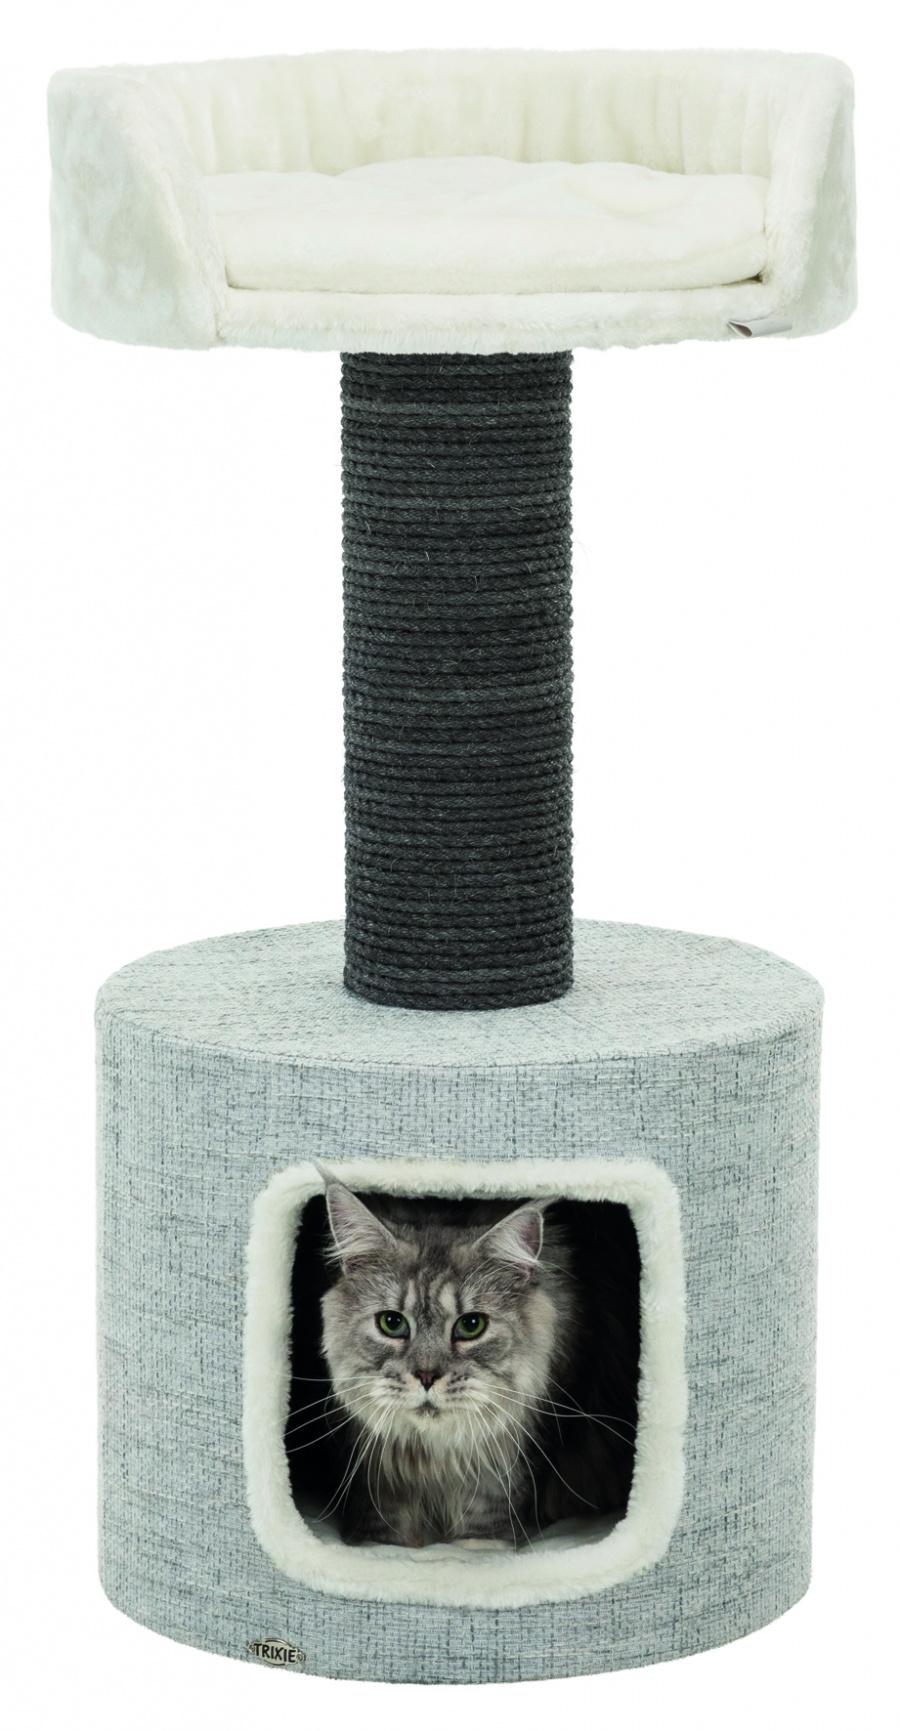 Mājiņa kaķiem - Trixie Fonda XXL